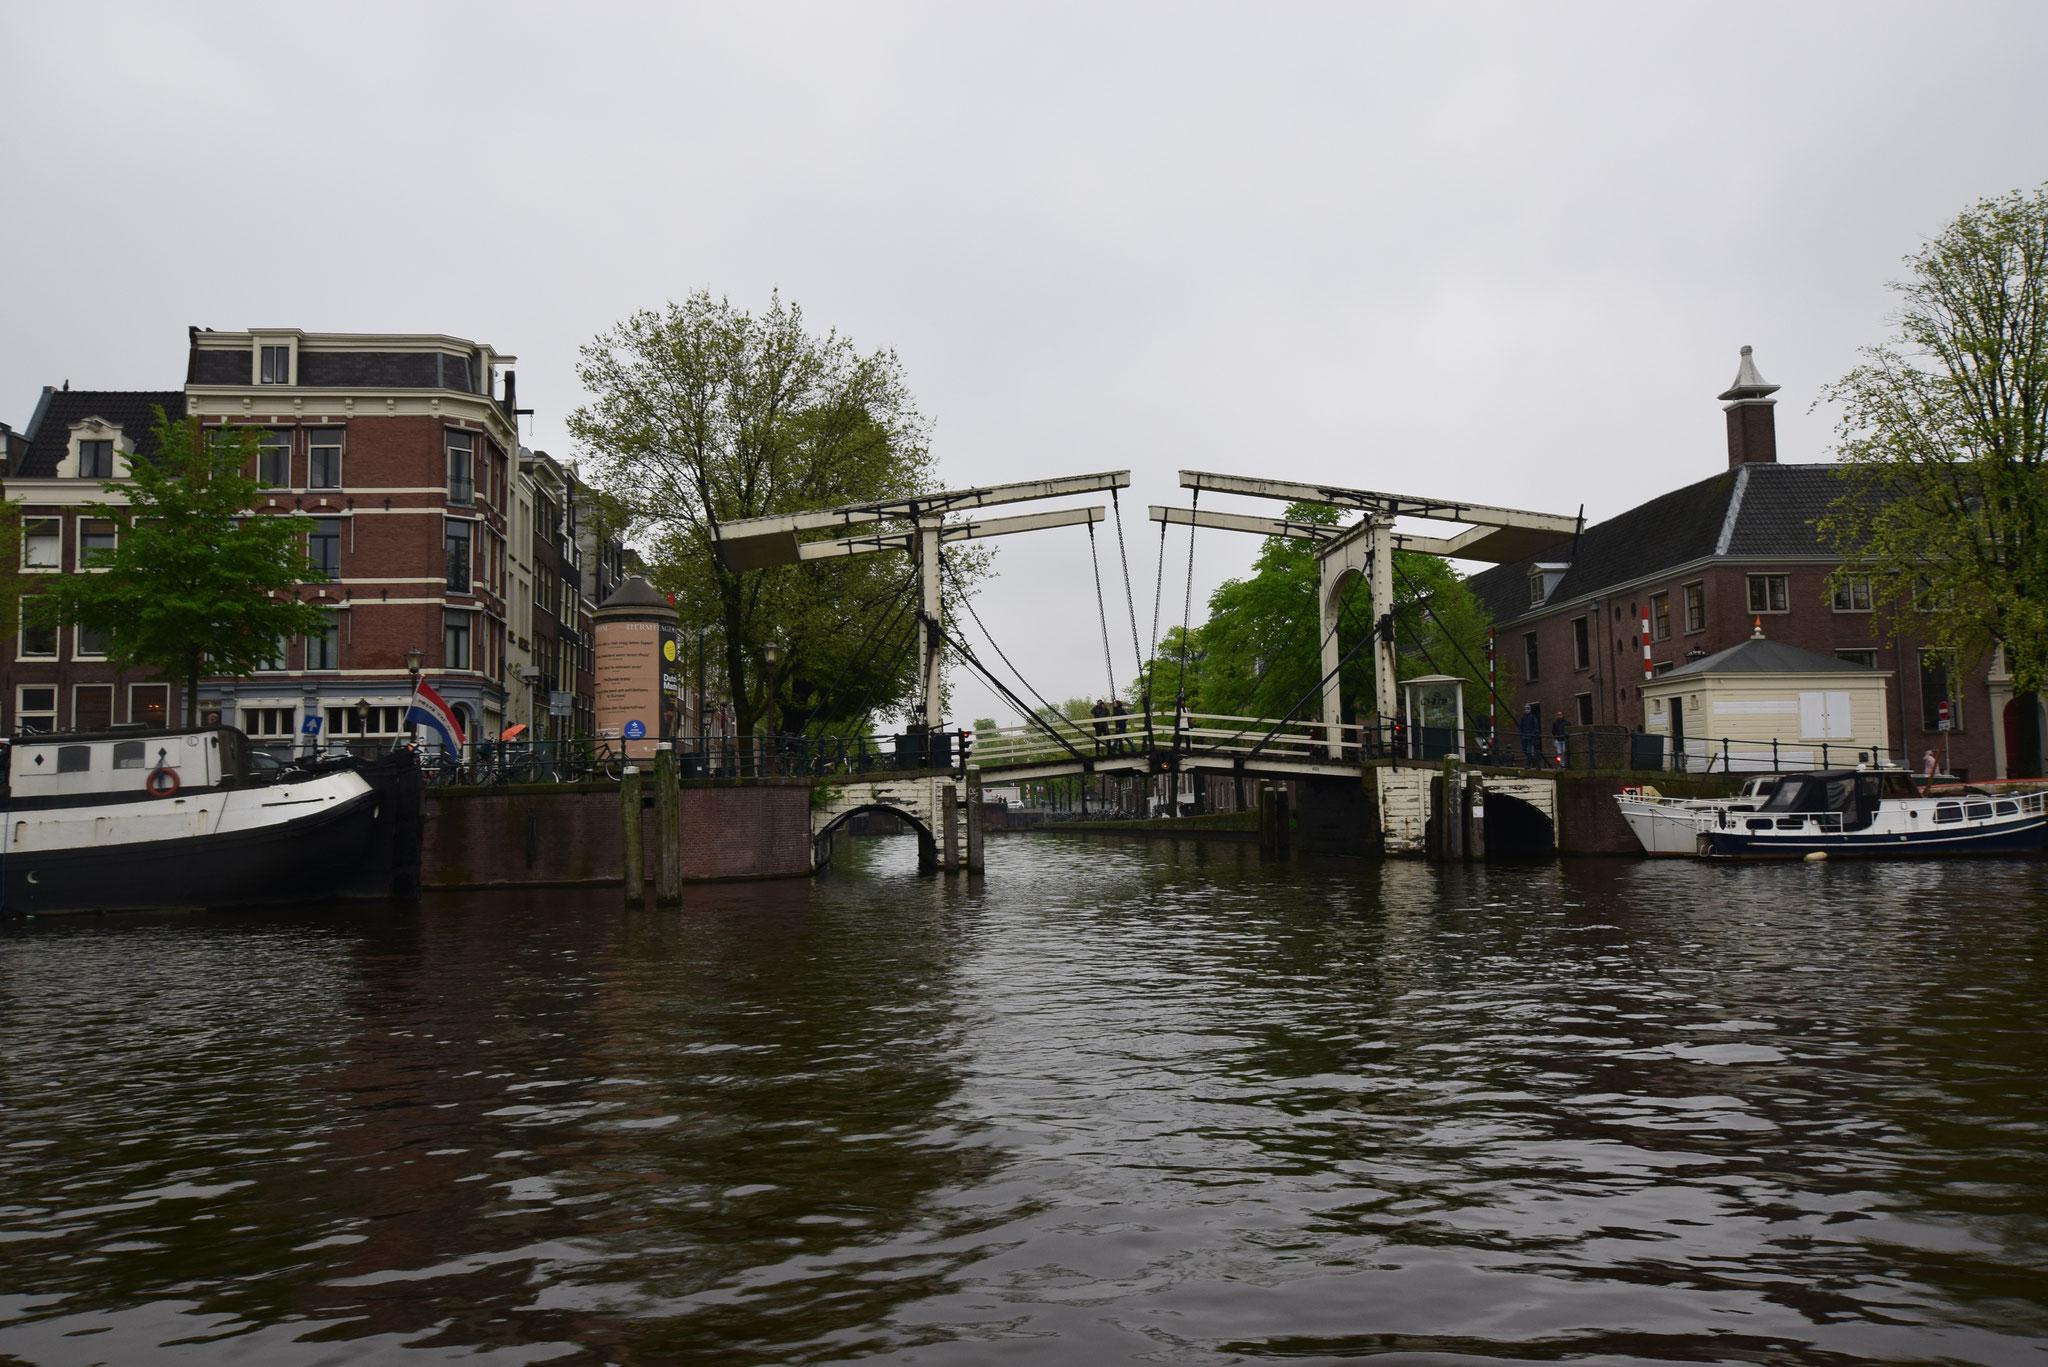 04-18 Zugbrücke über den Kanal